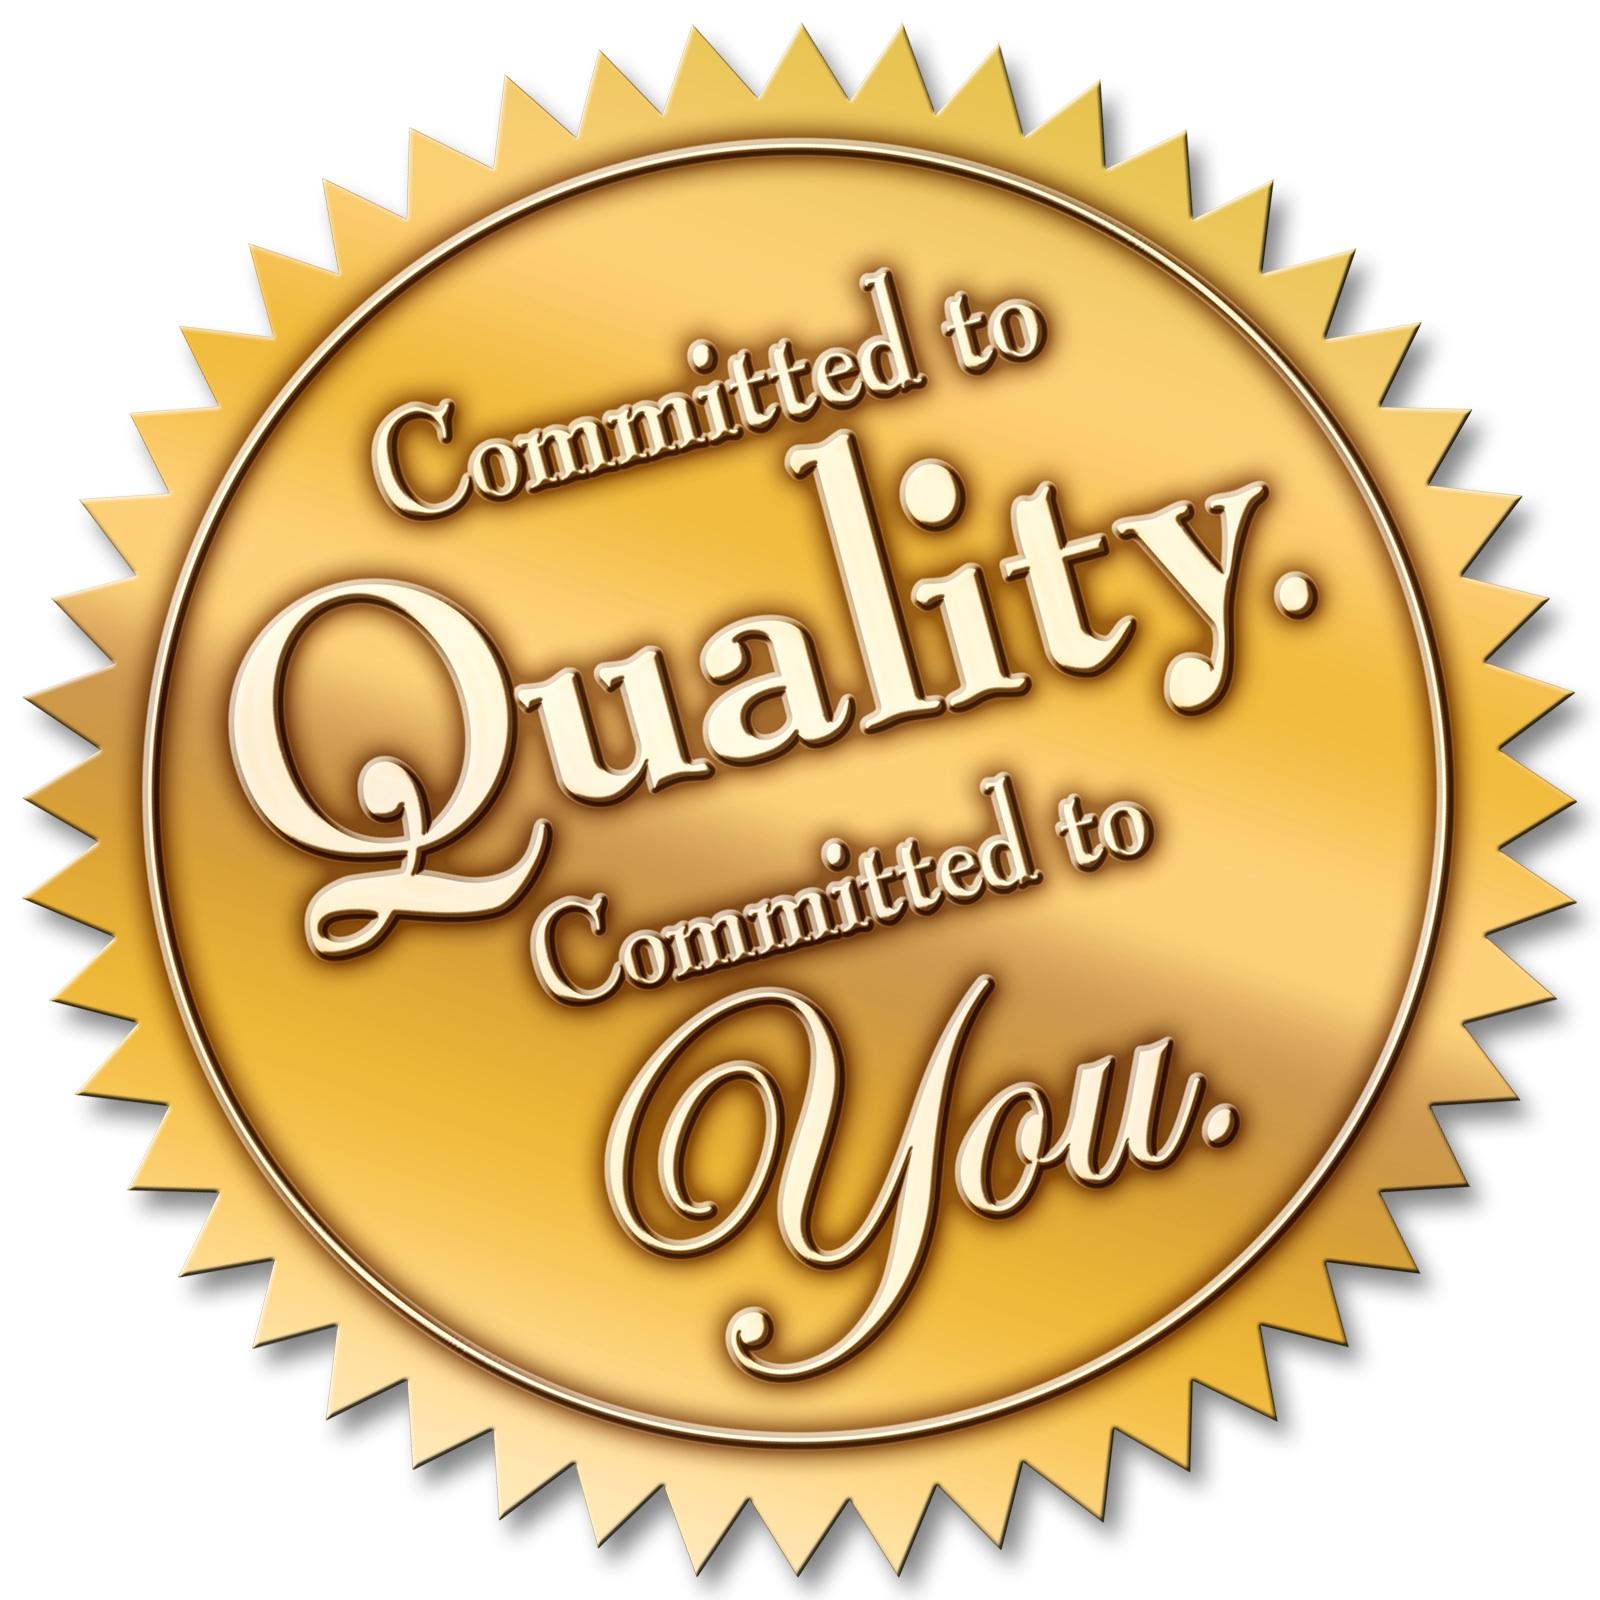 Design your own t shirt good quality - Design Your Own T Shirt Good Quality 74